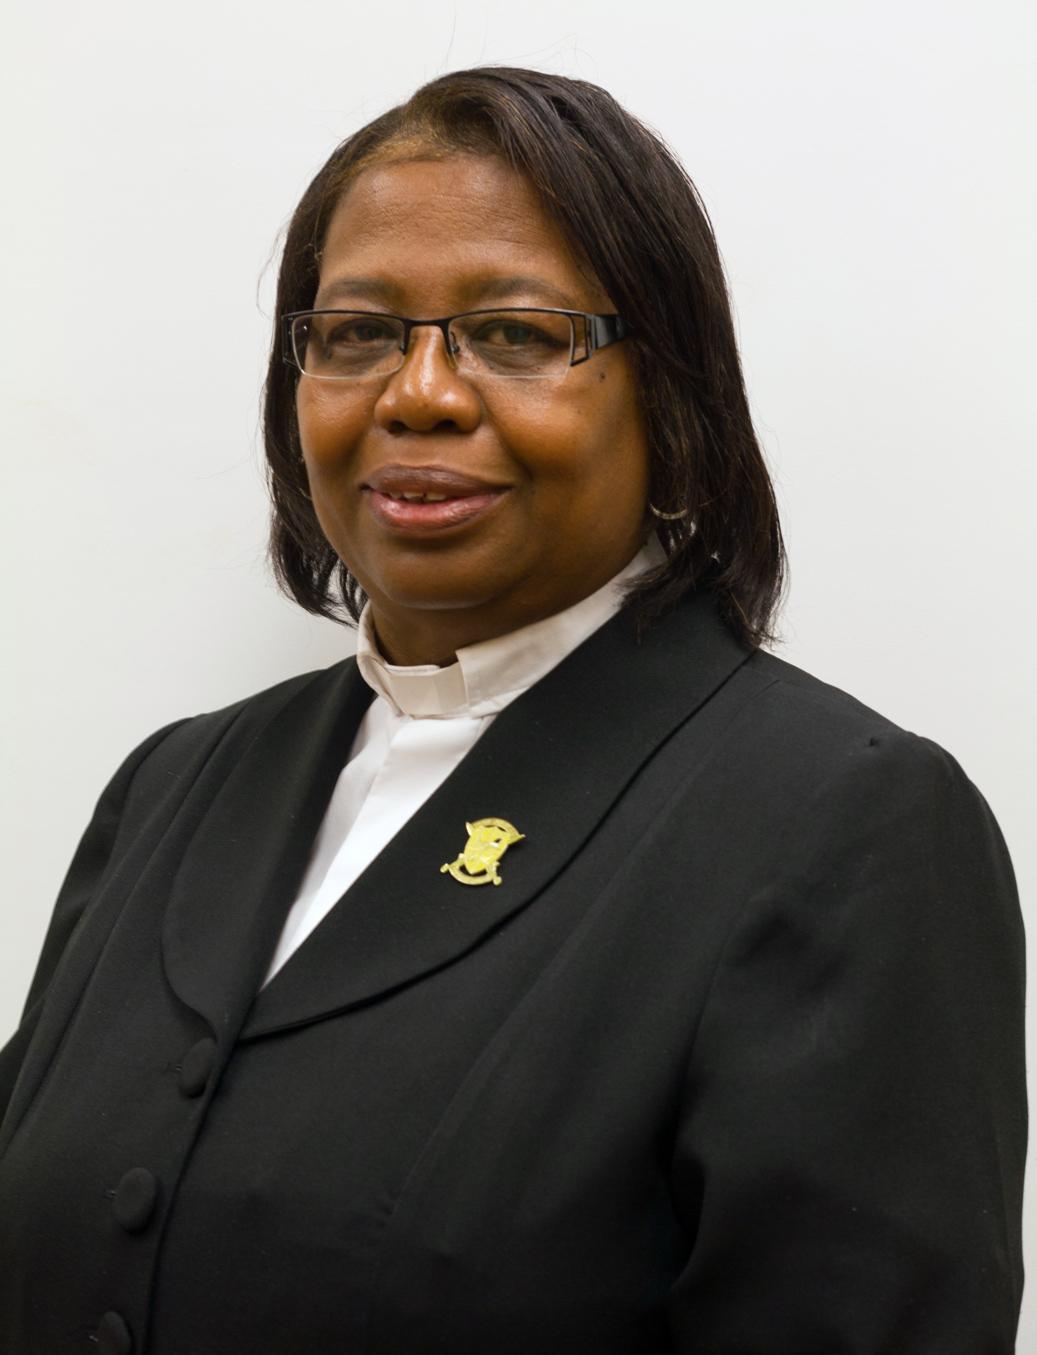 Elder Linda Brown